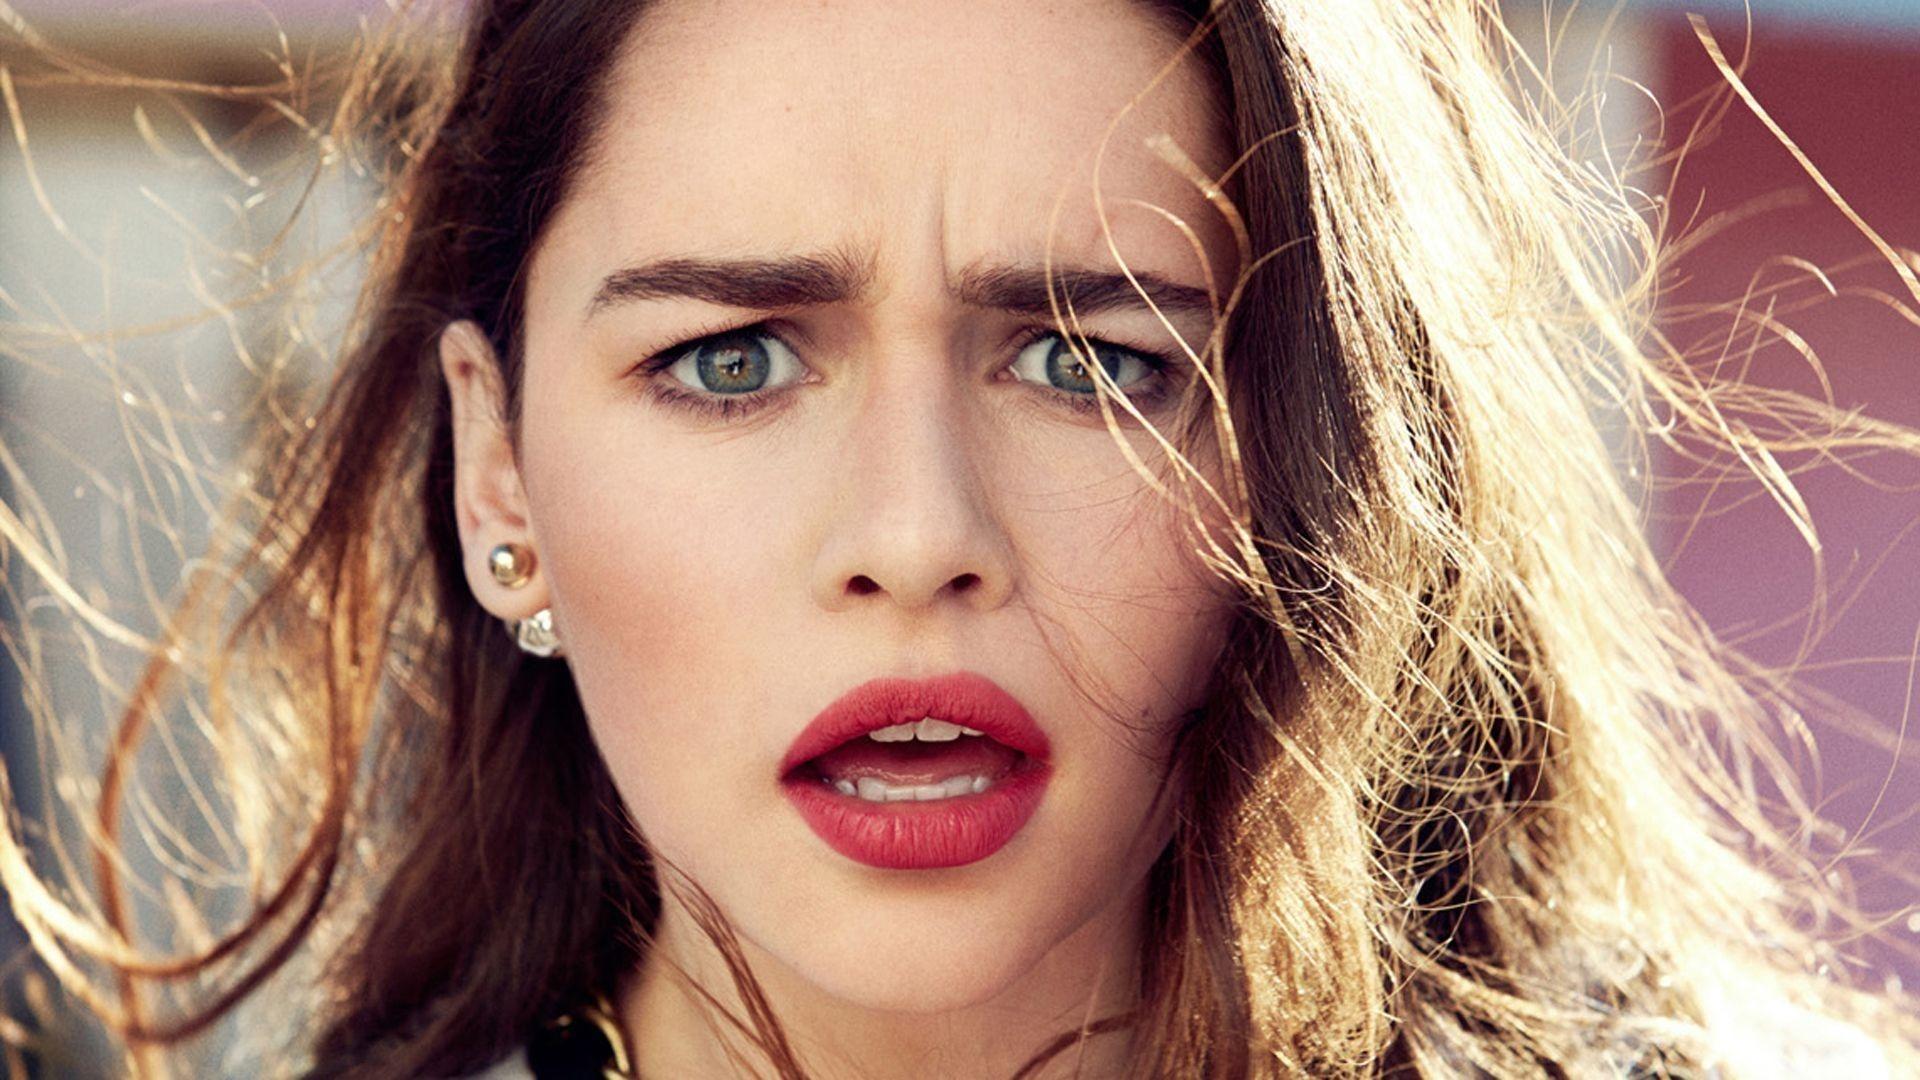 Emilia Clarke Download Wallpaper